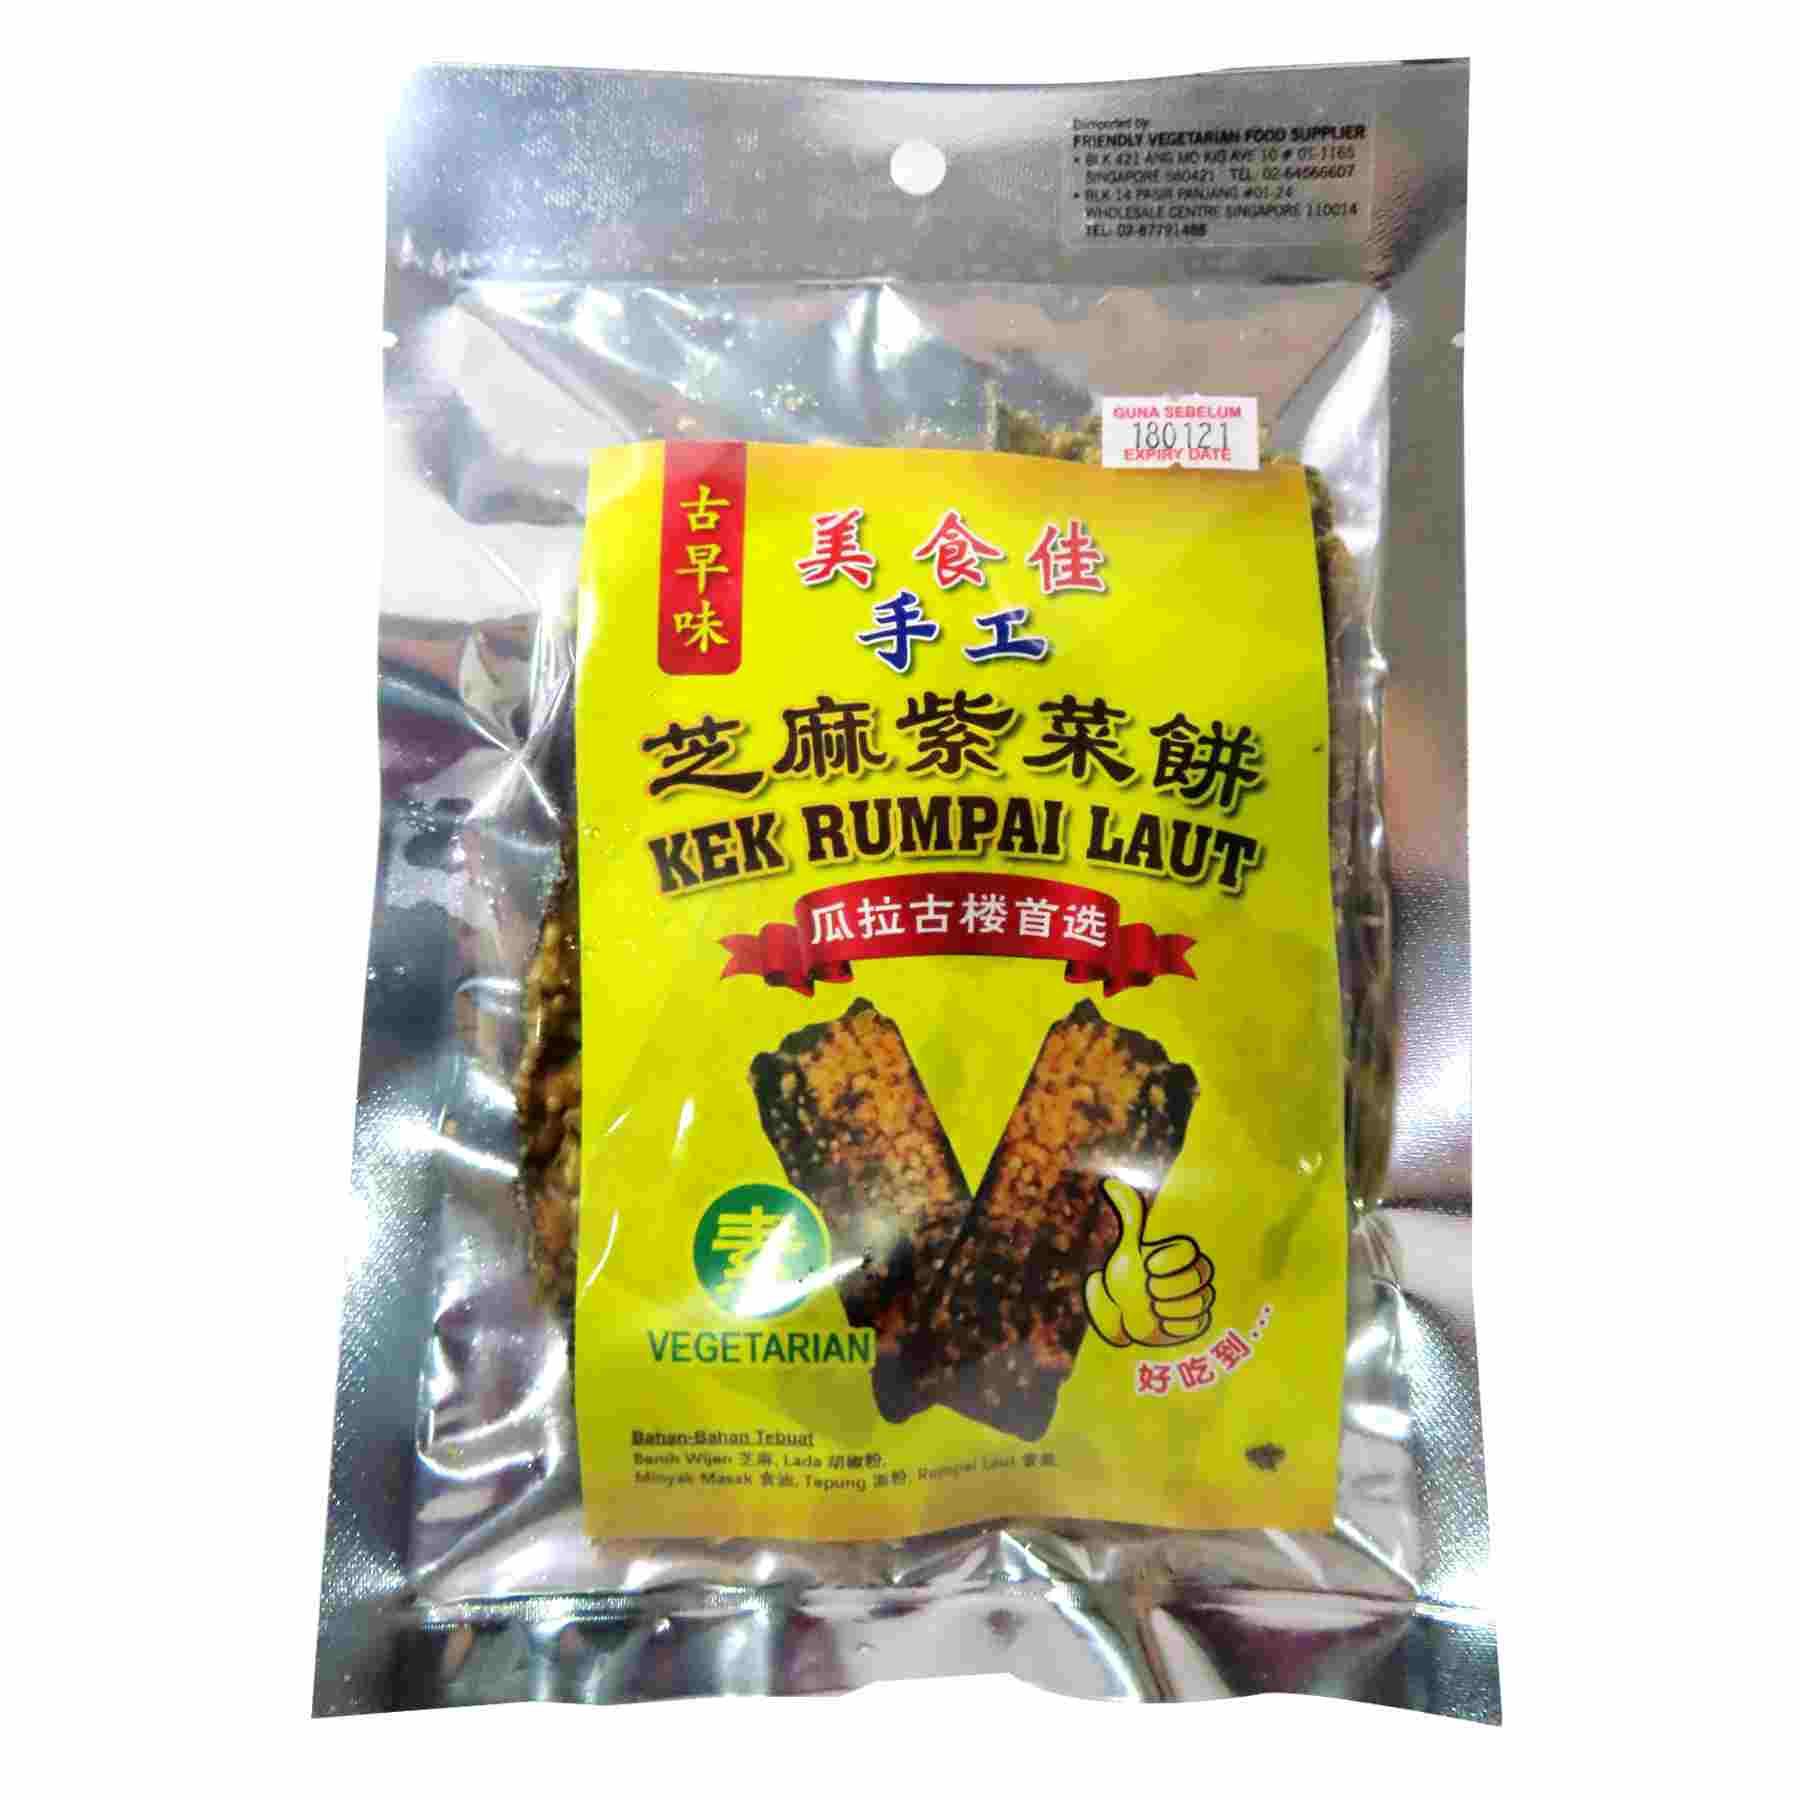 Image Sesame Seaweed Crisps 古早味 - 芝麻紫菜饼 50grams